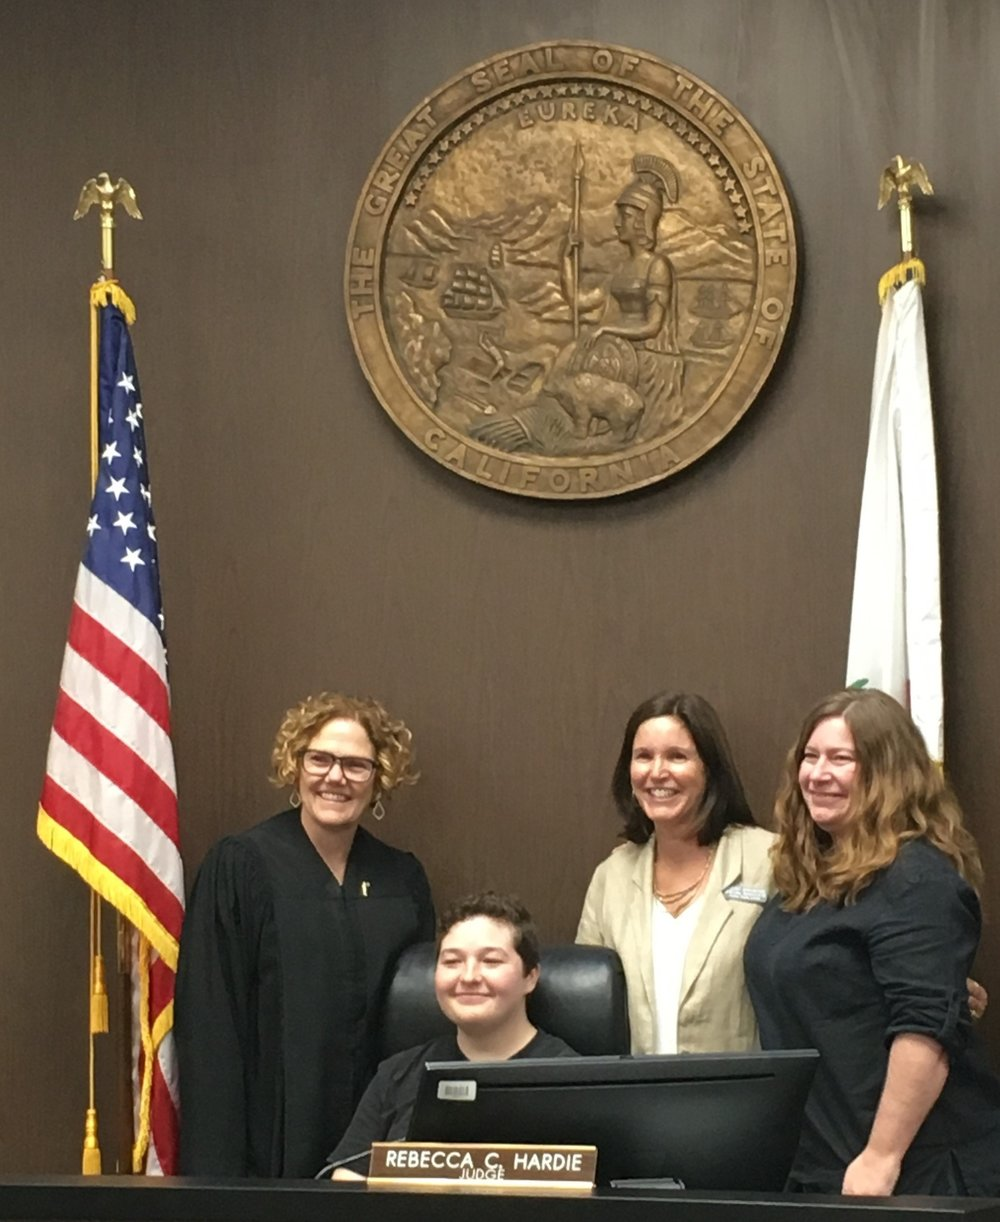 Judge Rebecca Hardie makes Ryan's adoption official!